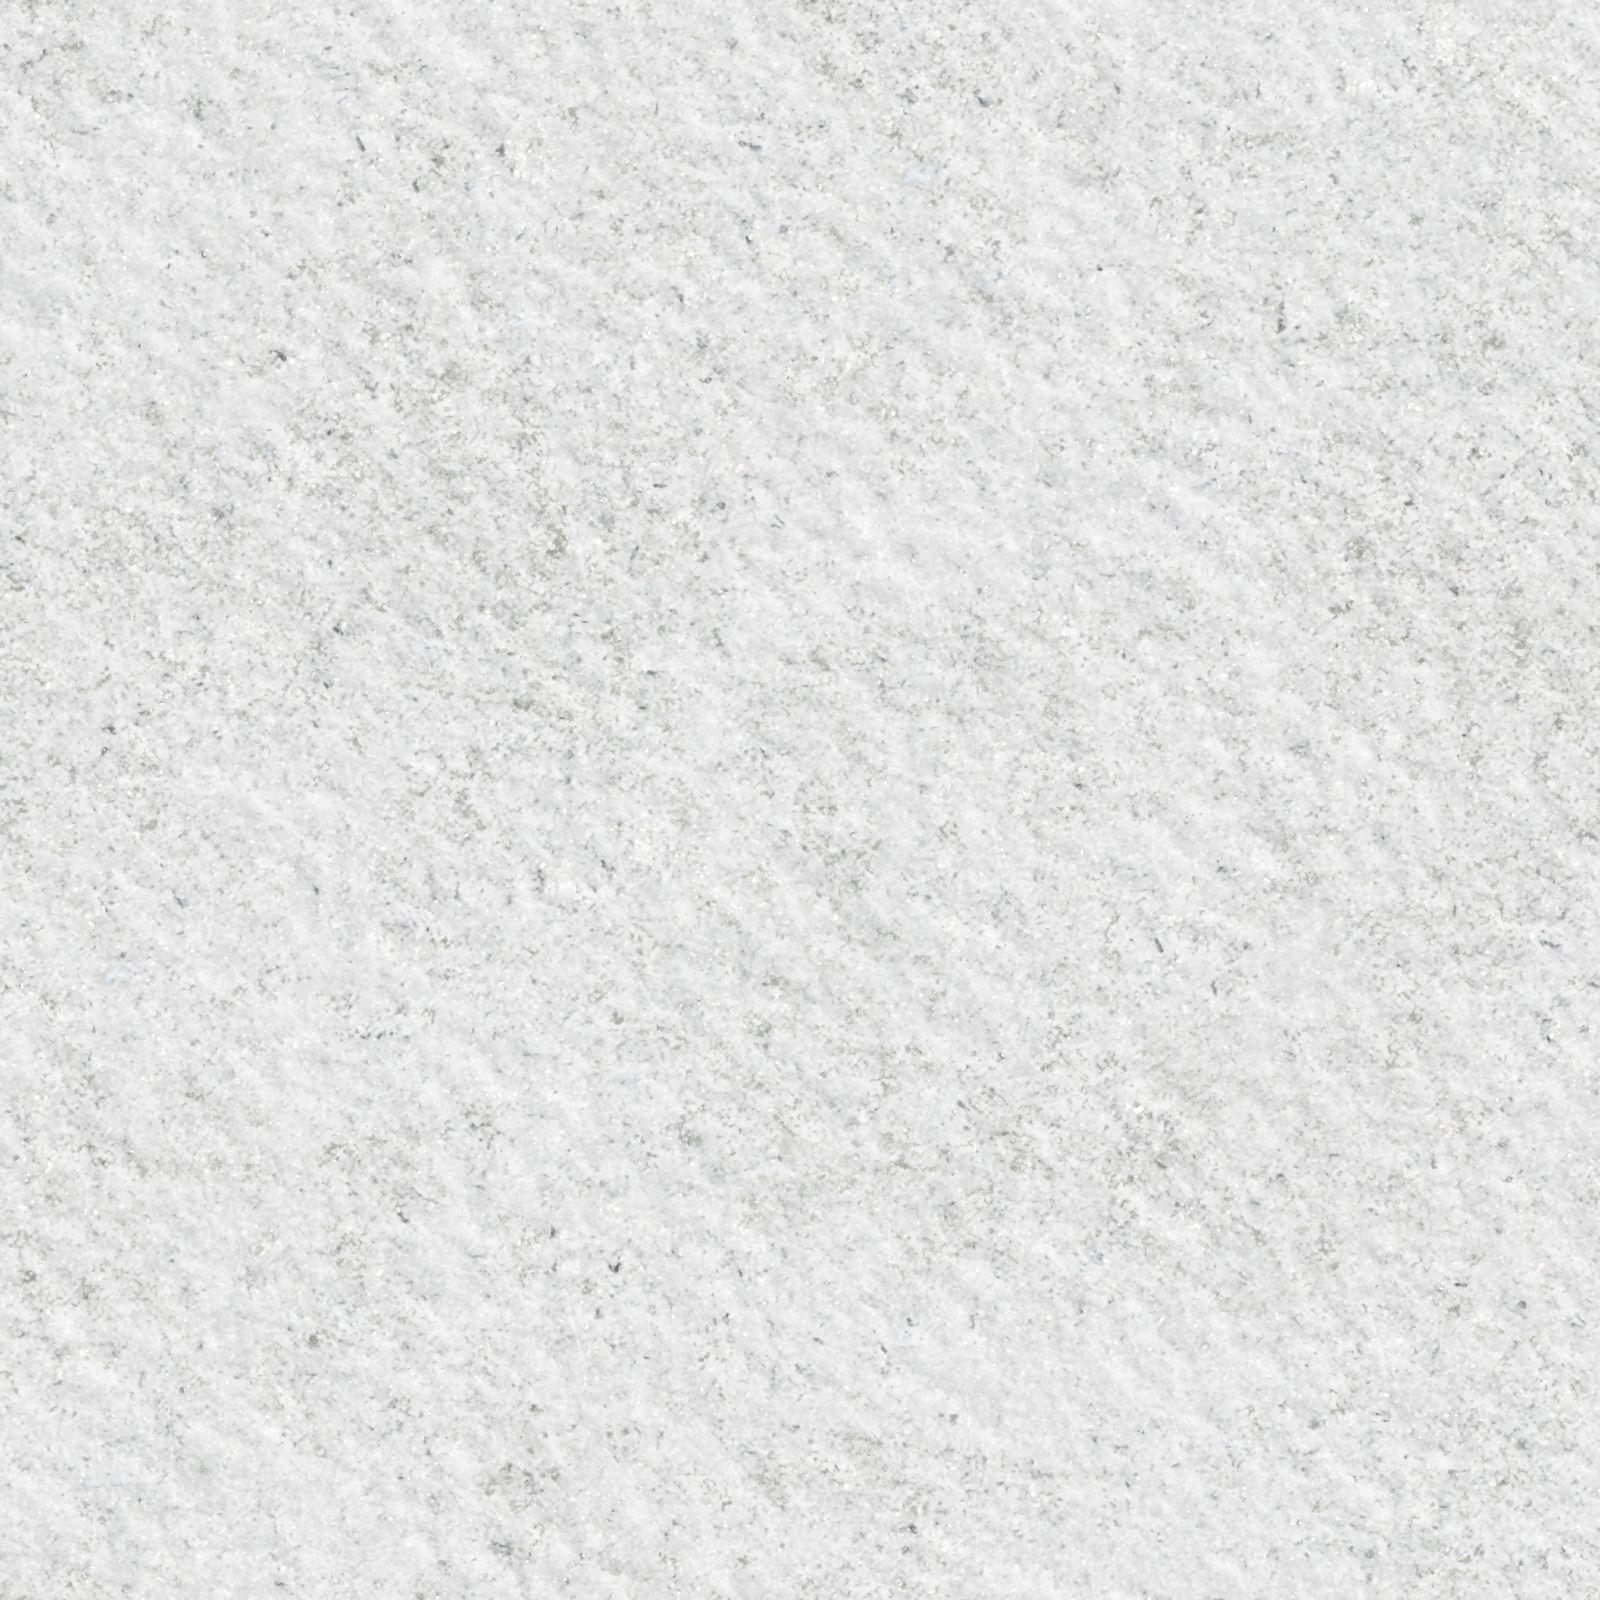 High Resolution Seamless Textures Free Seamless Ground